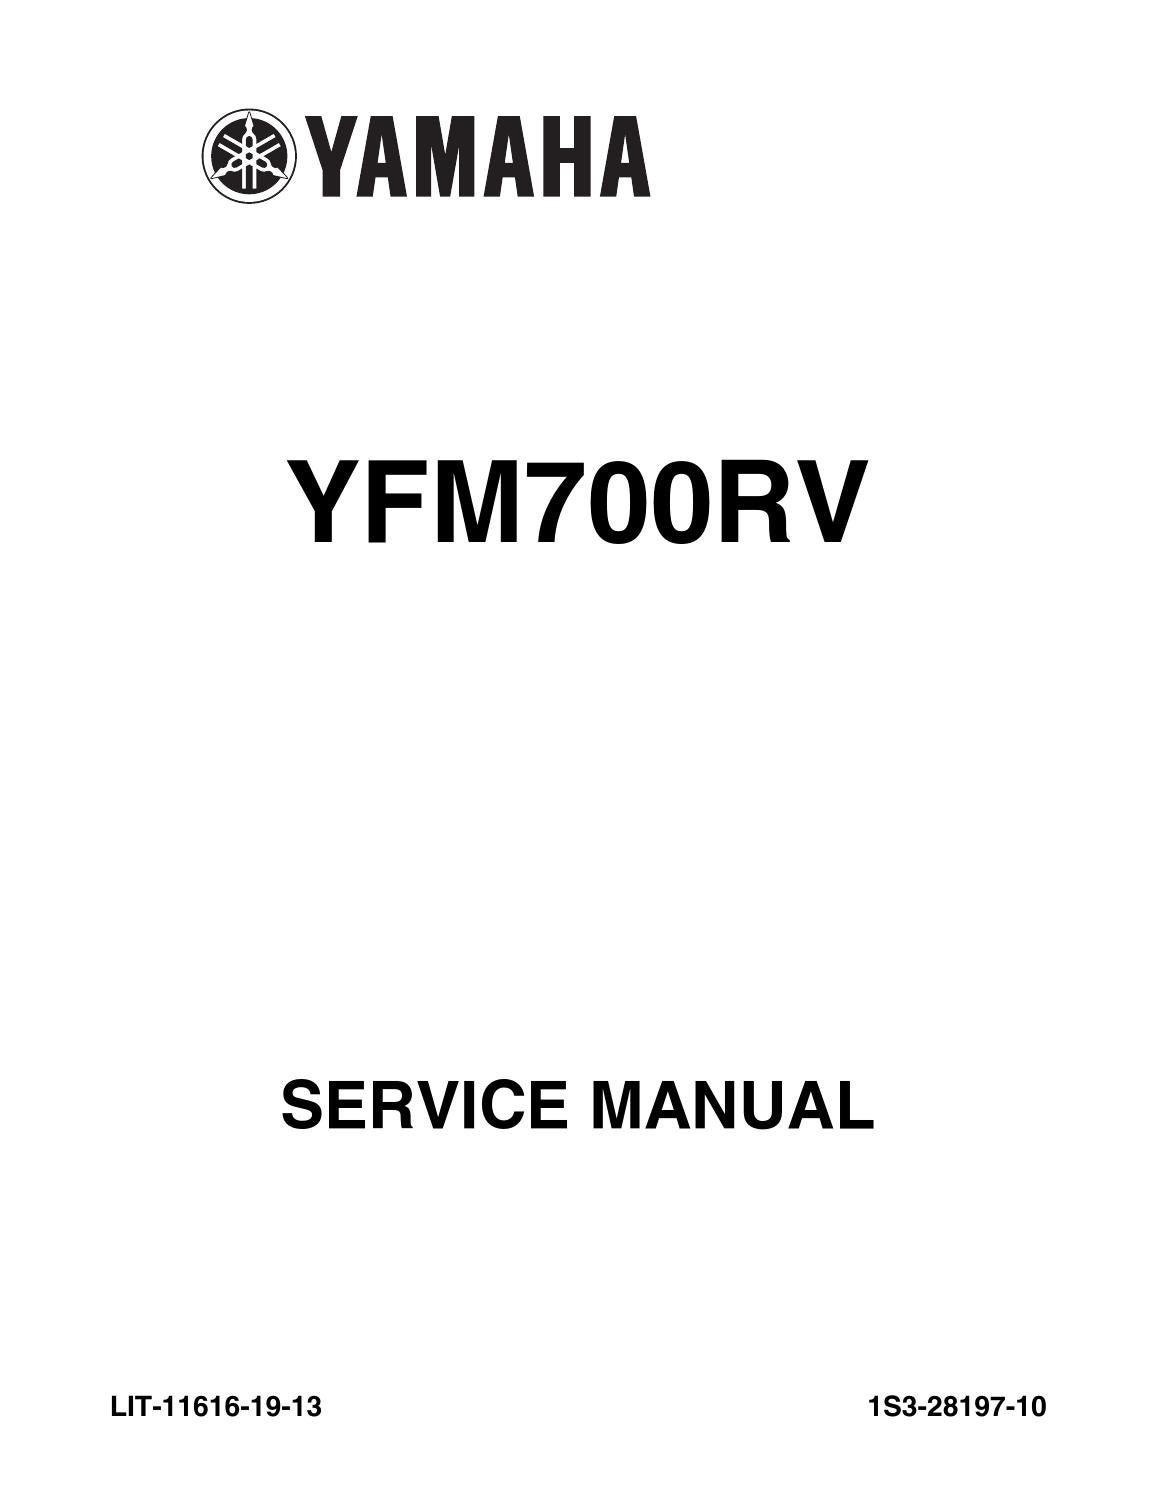 20a raptor chip wiring diagram raptor 700 service manual lit 11616 19 13 by jesus ernesto rangel  raptor 700 service manual lit 11616 19